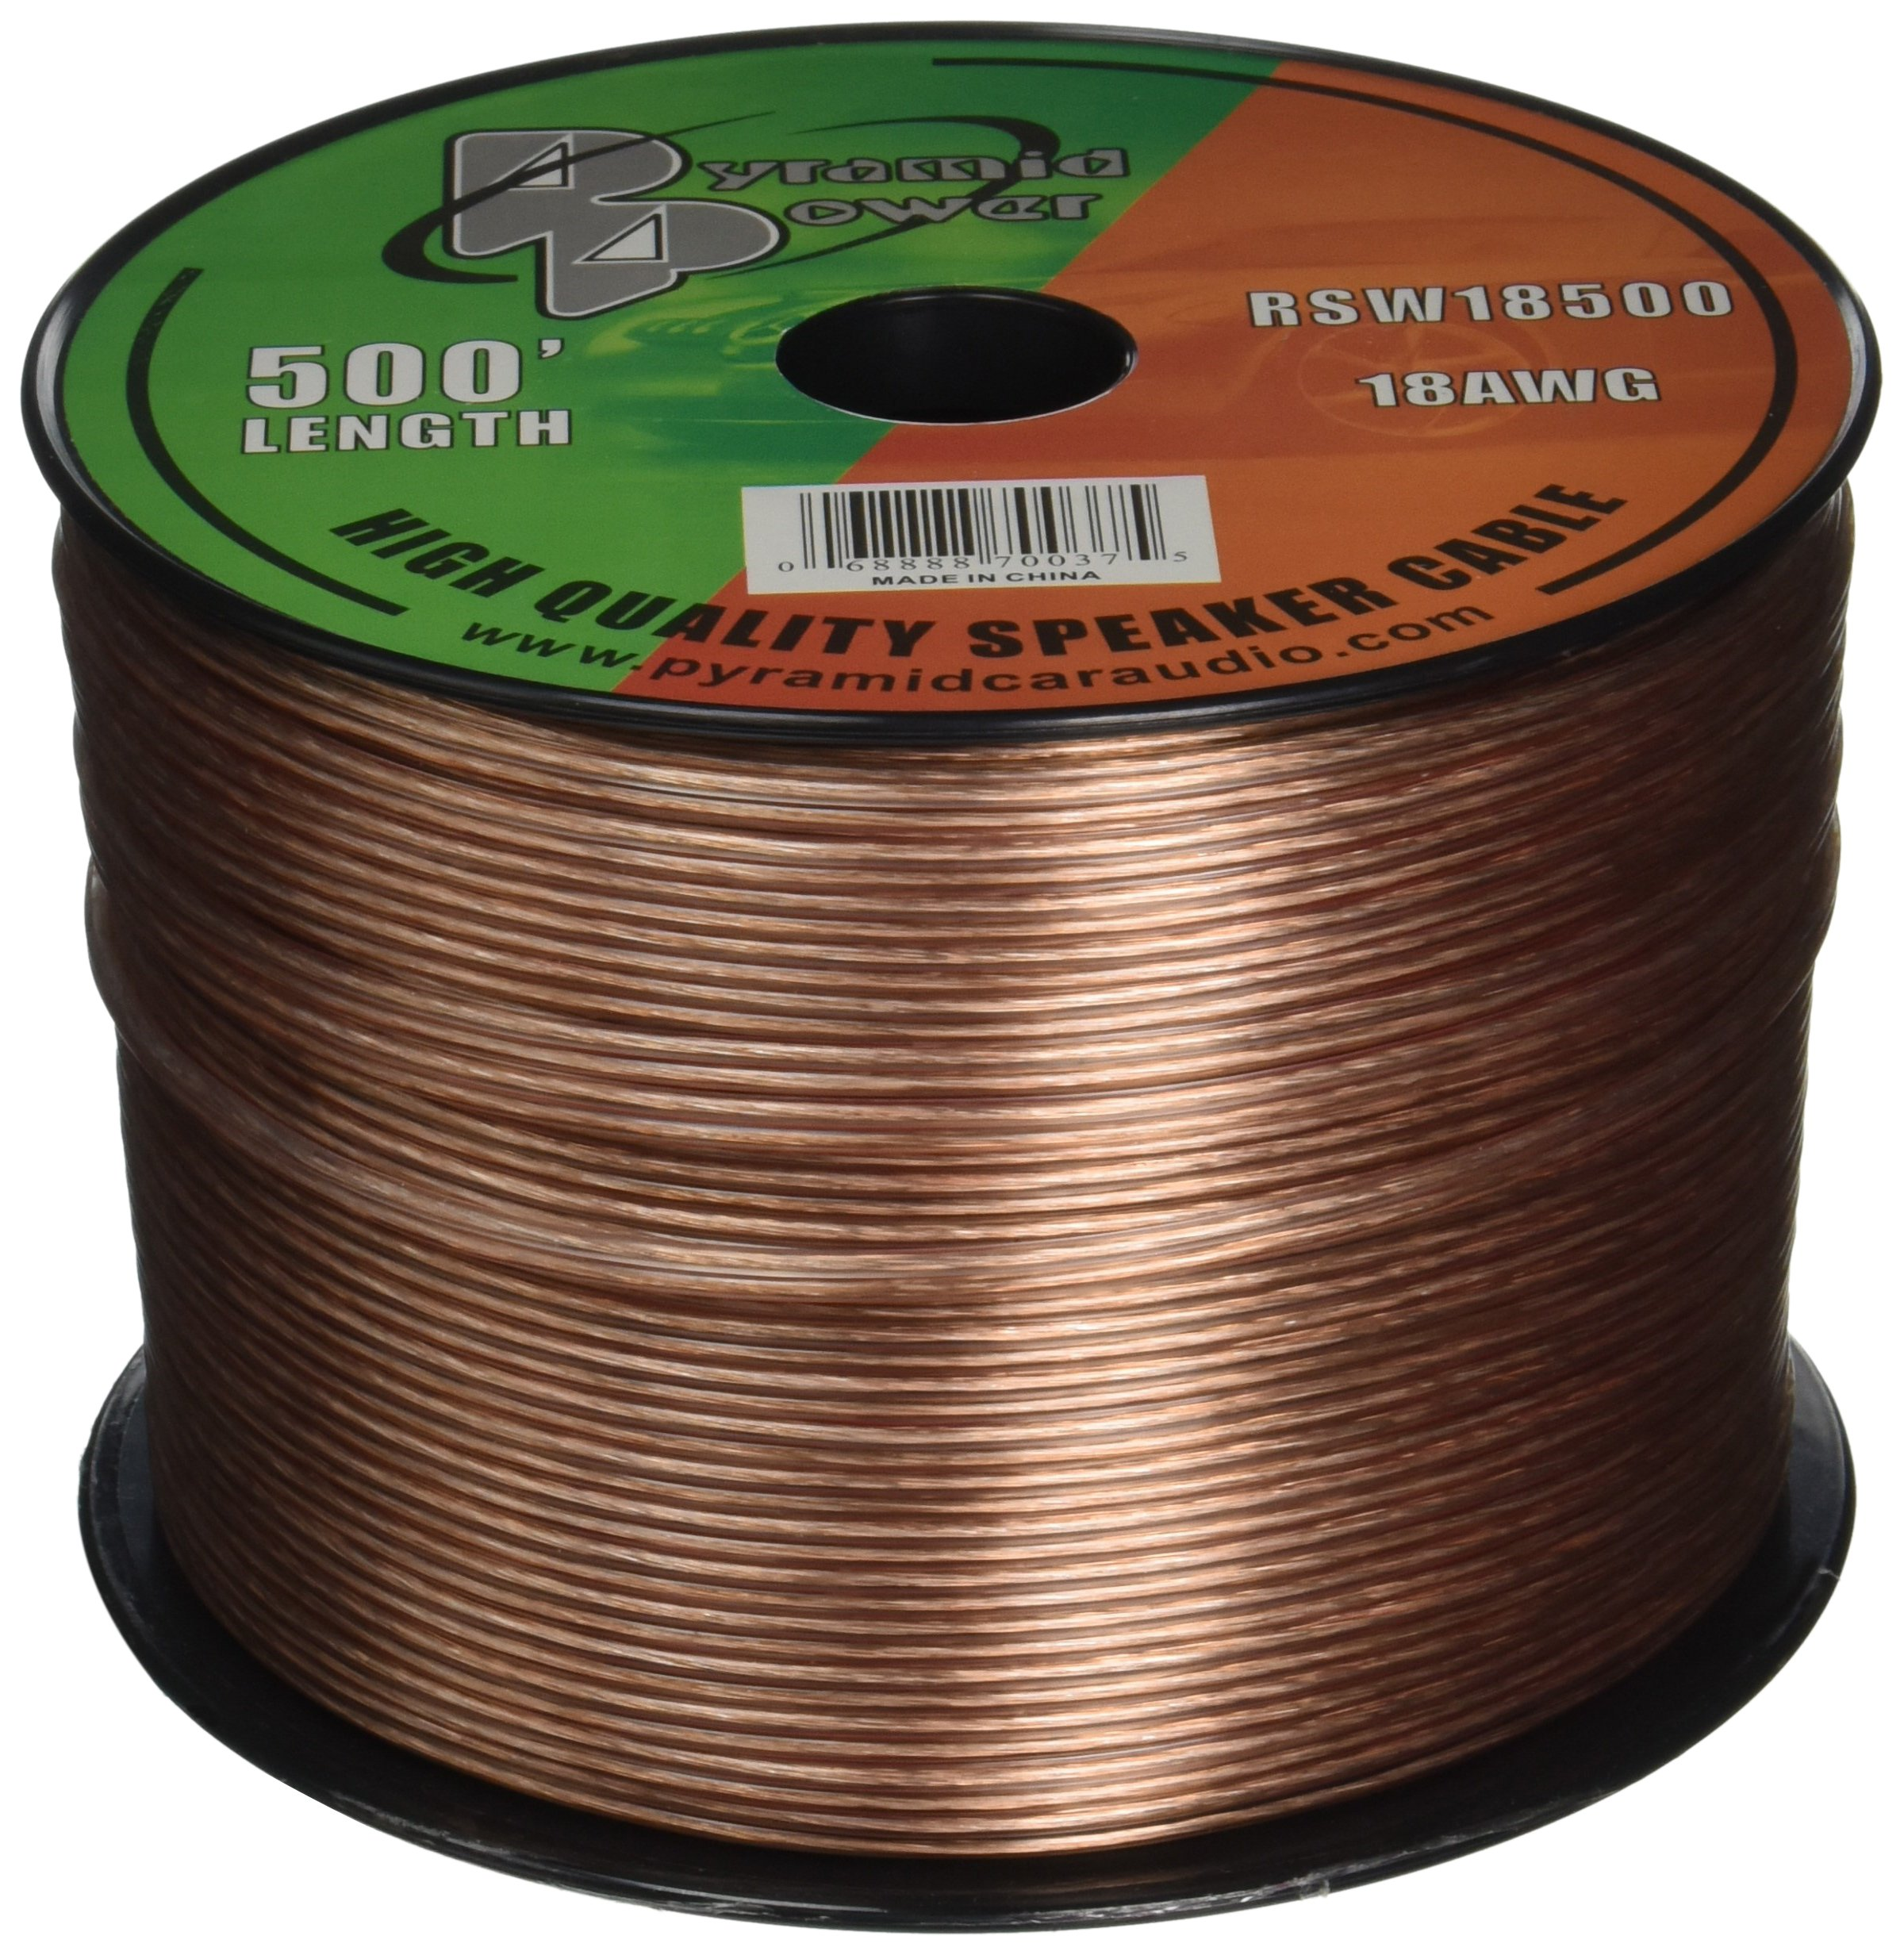 Pyramid RSW18500 18 Gauge 500 Feet Spool of Speaker Zip Wire